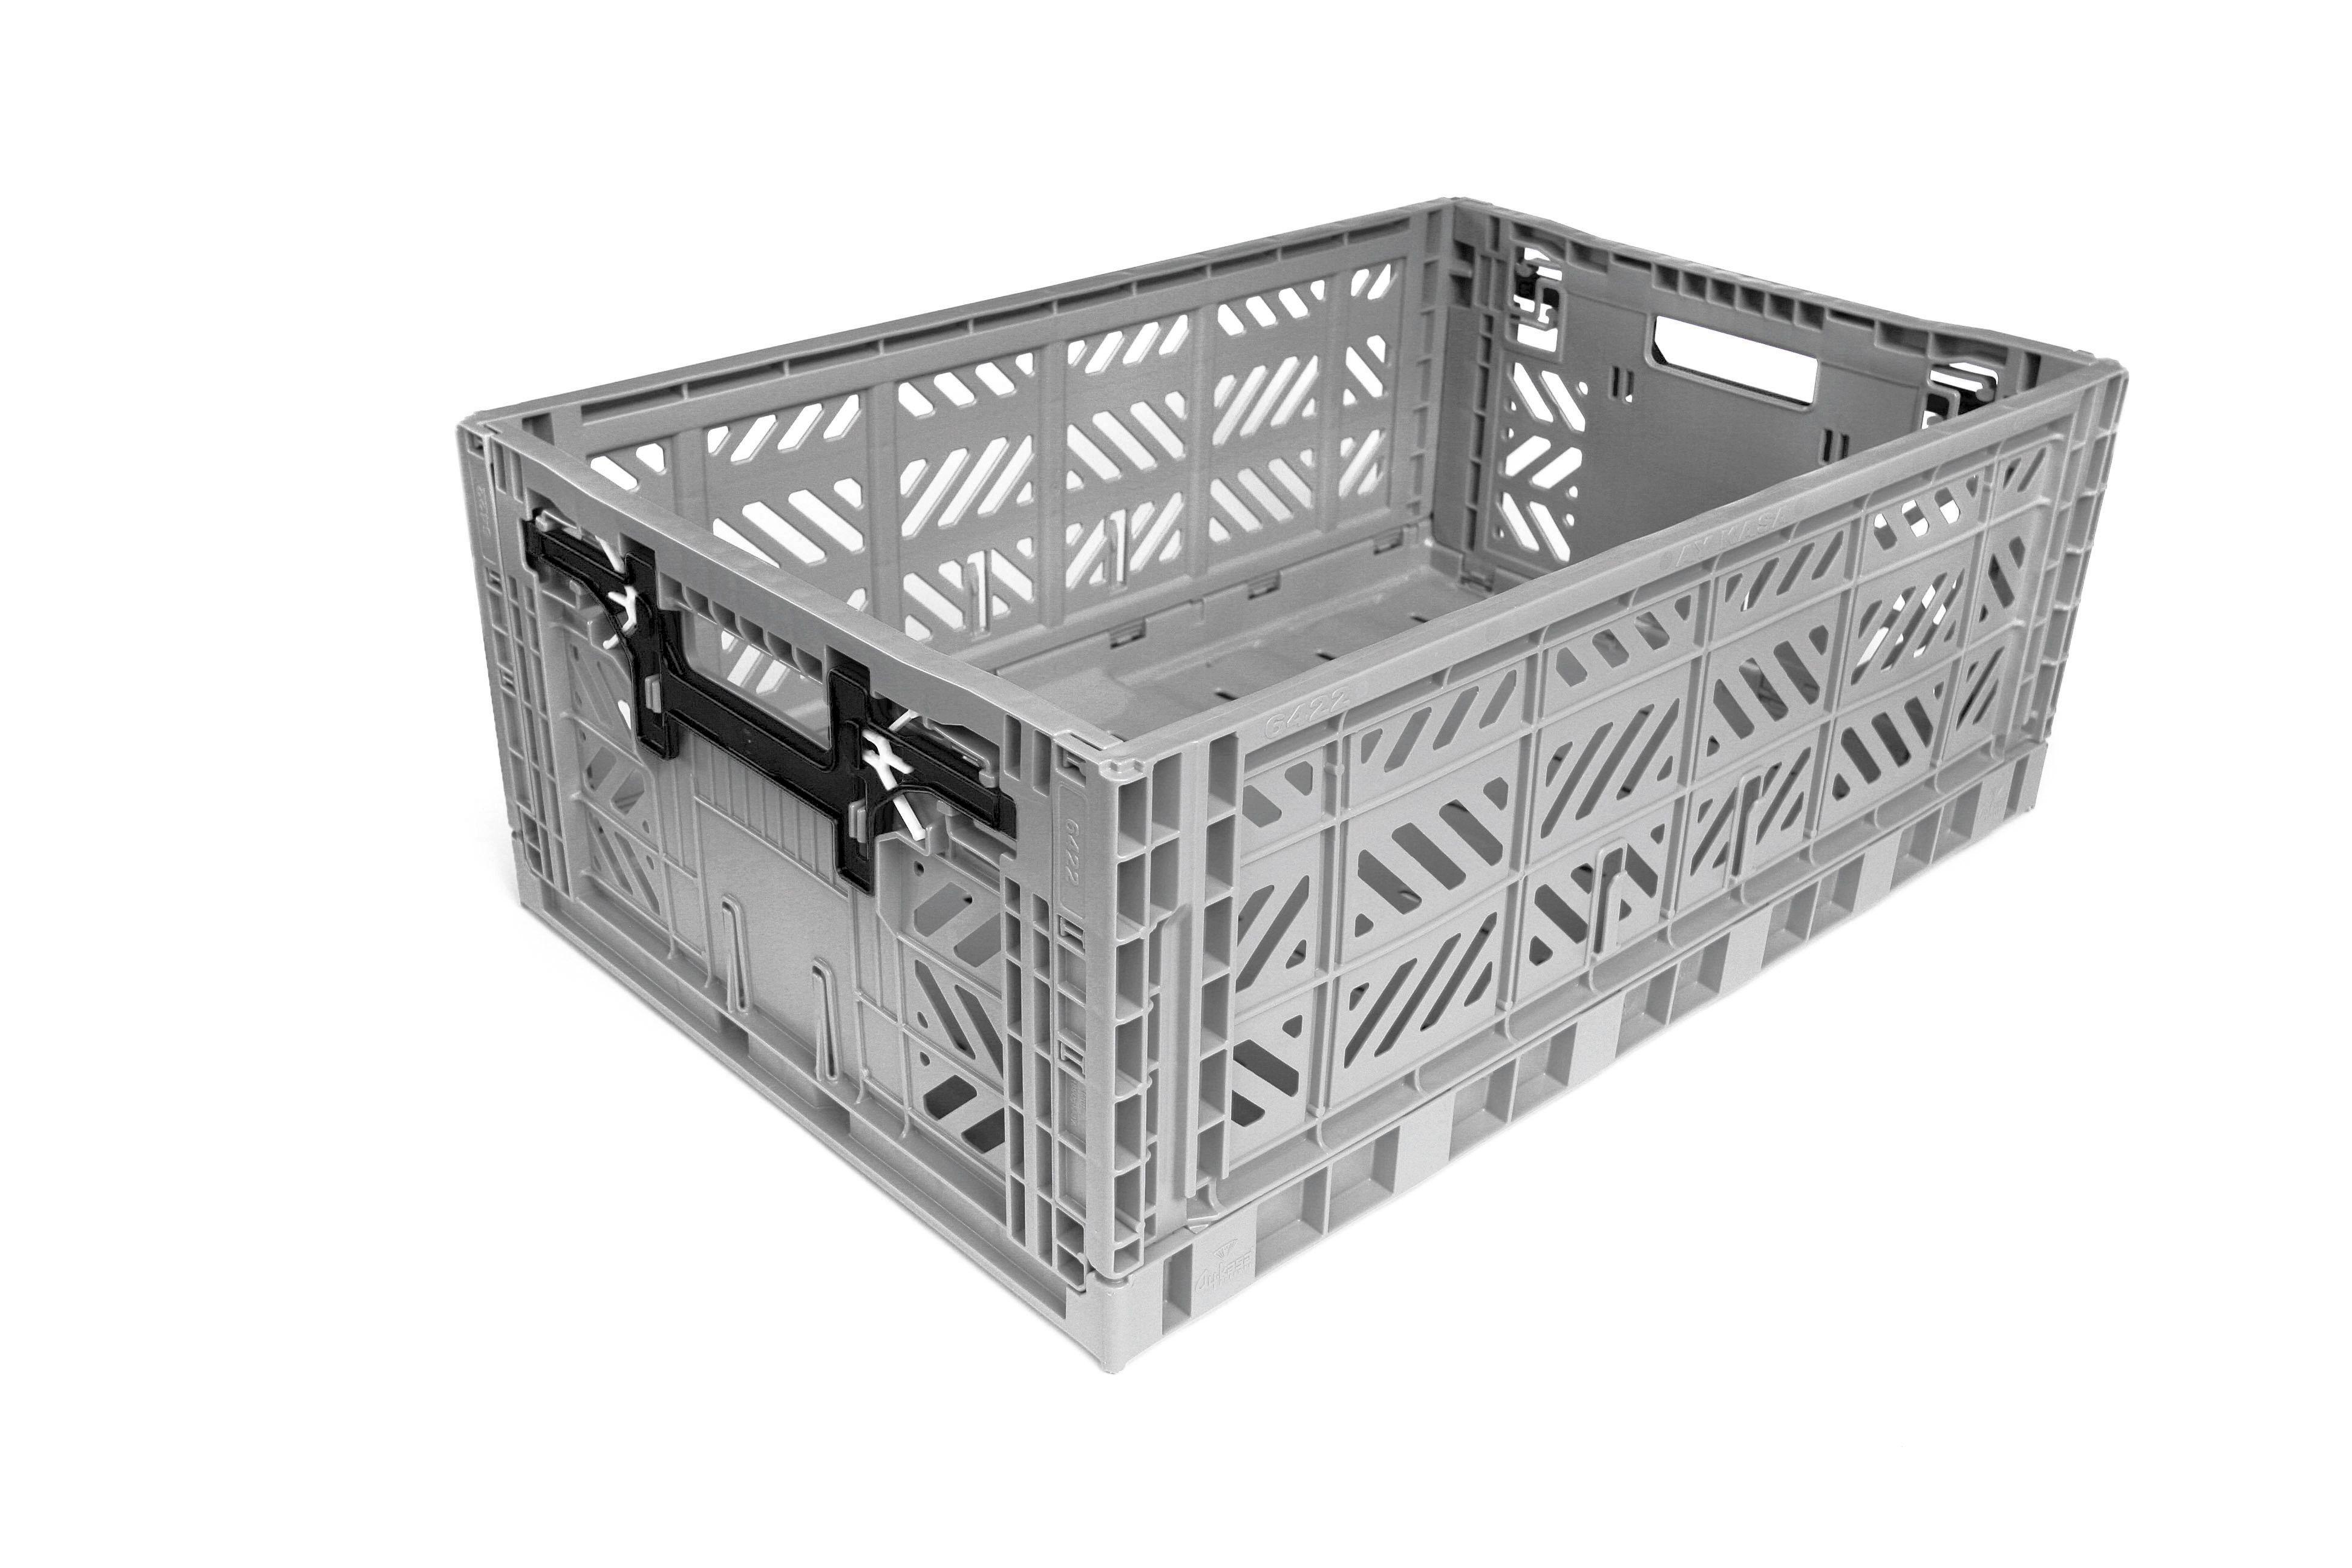 klappbox maxi 22 al grau recycling surplus systems gmbh. Black Bedroom Furniture Sets. Home Design Ideas